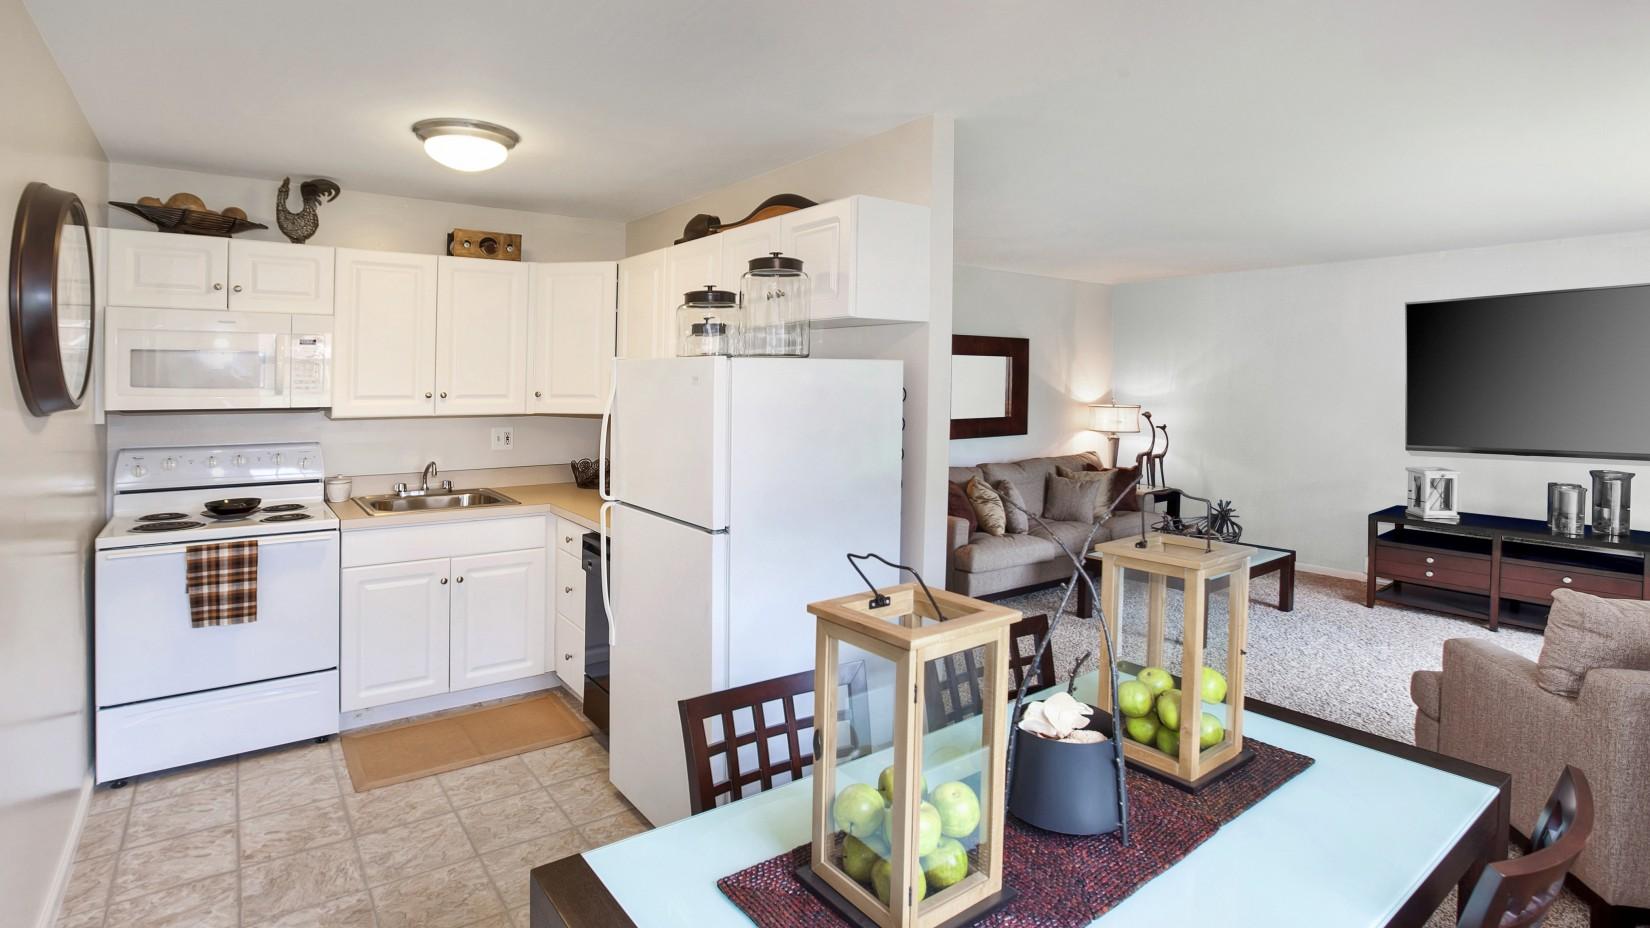 1 bedroom apartments in bethlehem pa mattress. Madison Wi 1 Bedroom Apartments   1 Bedroom Apartments La Crosse